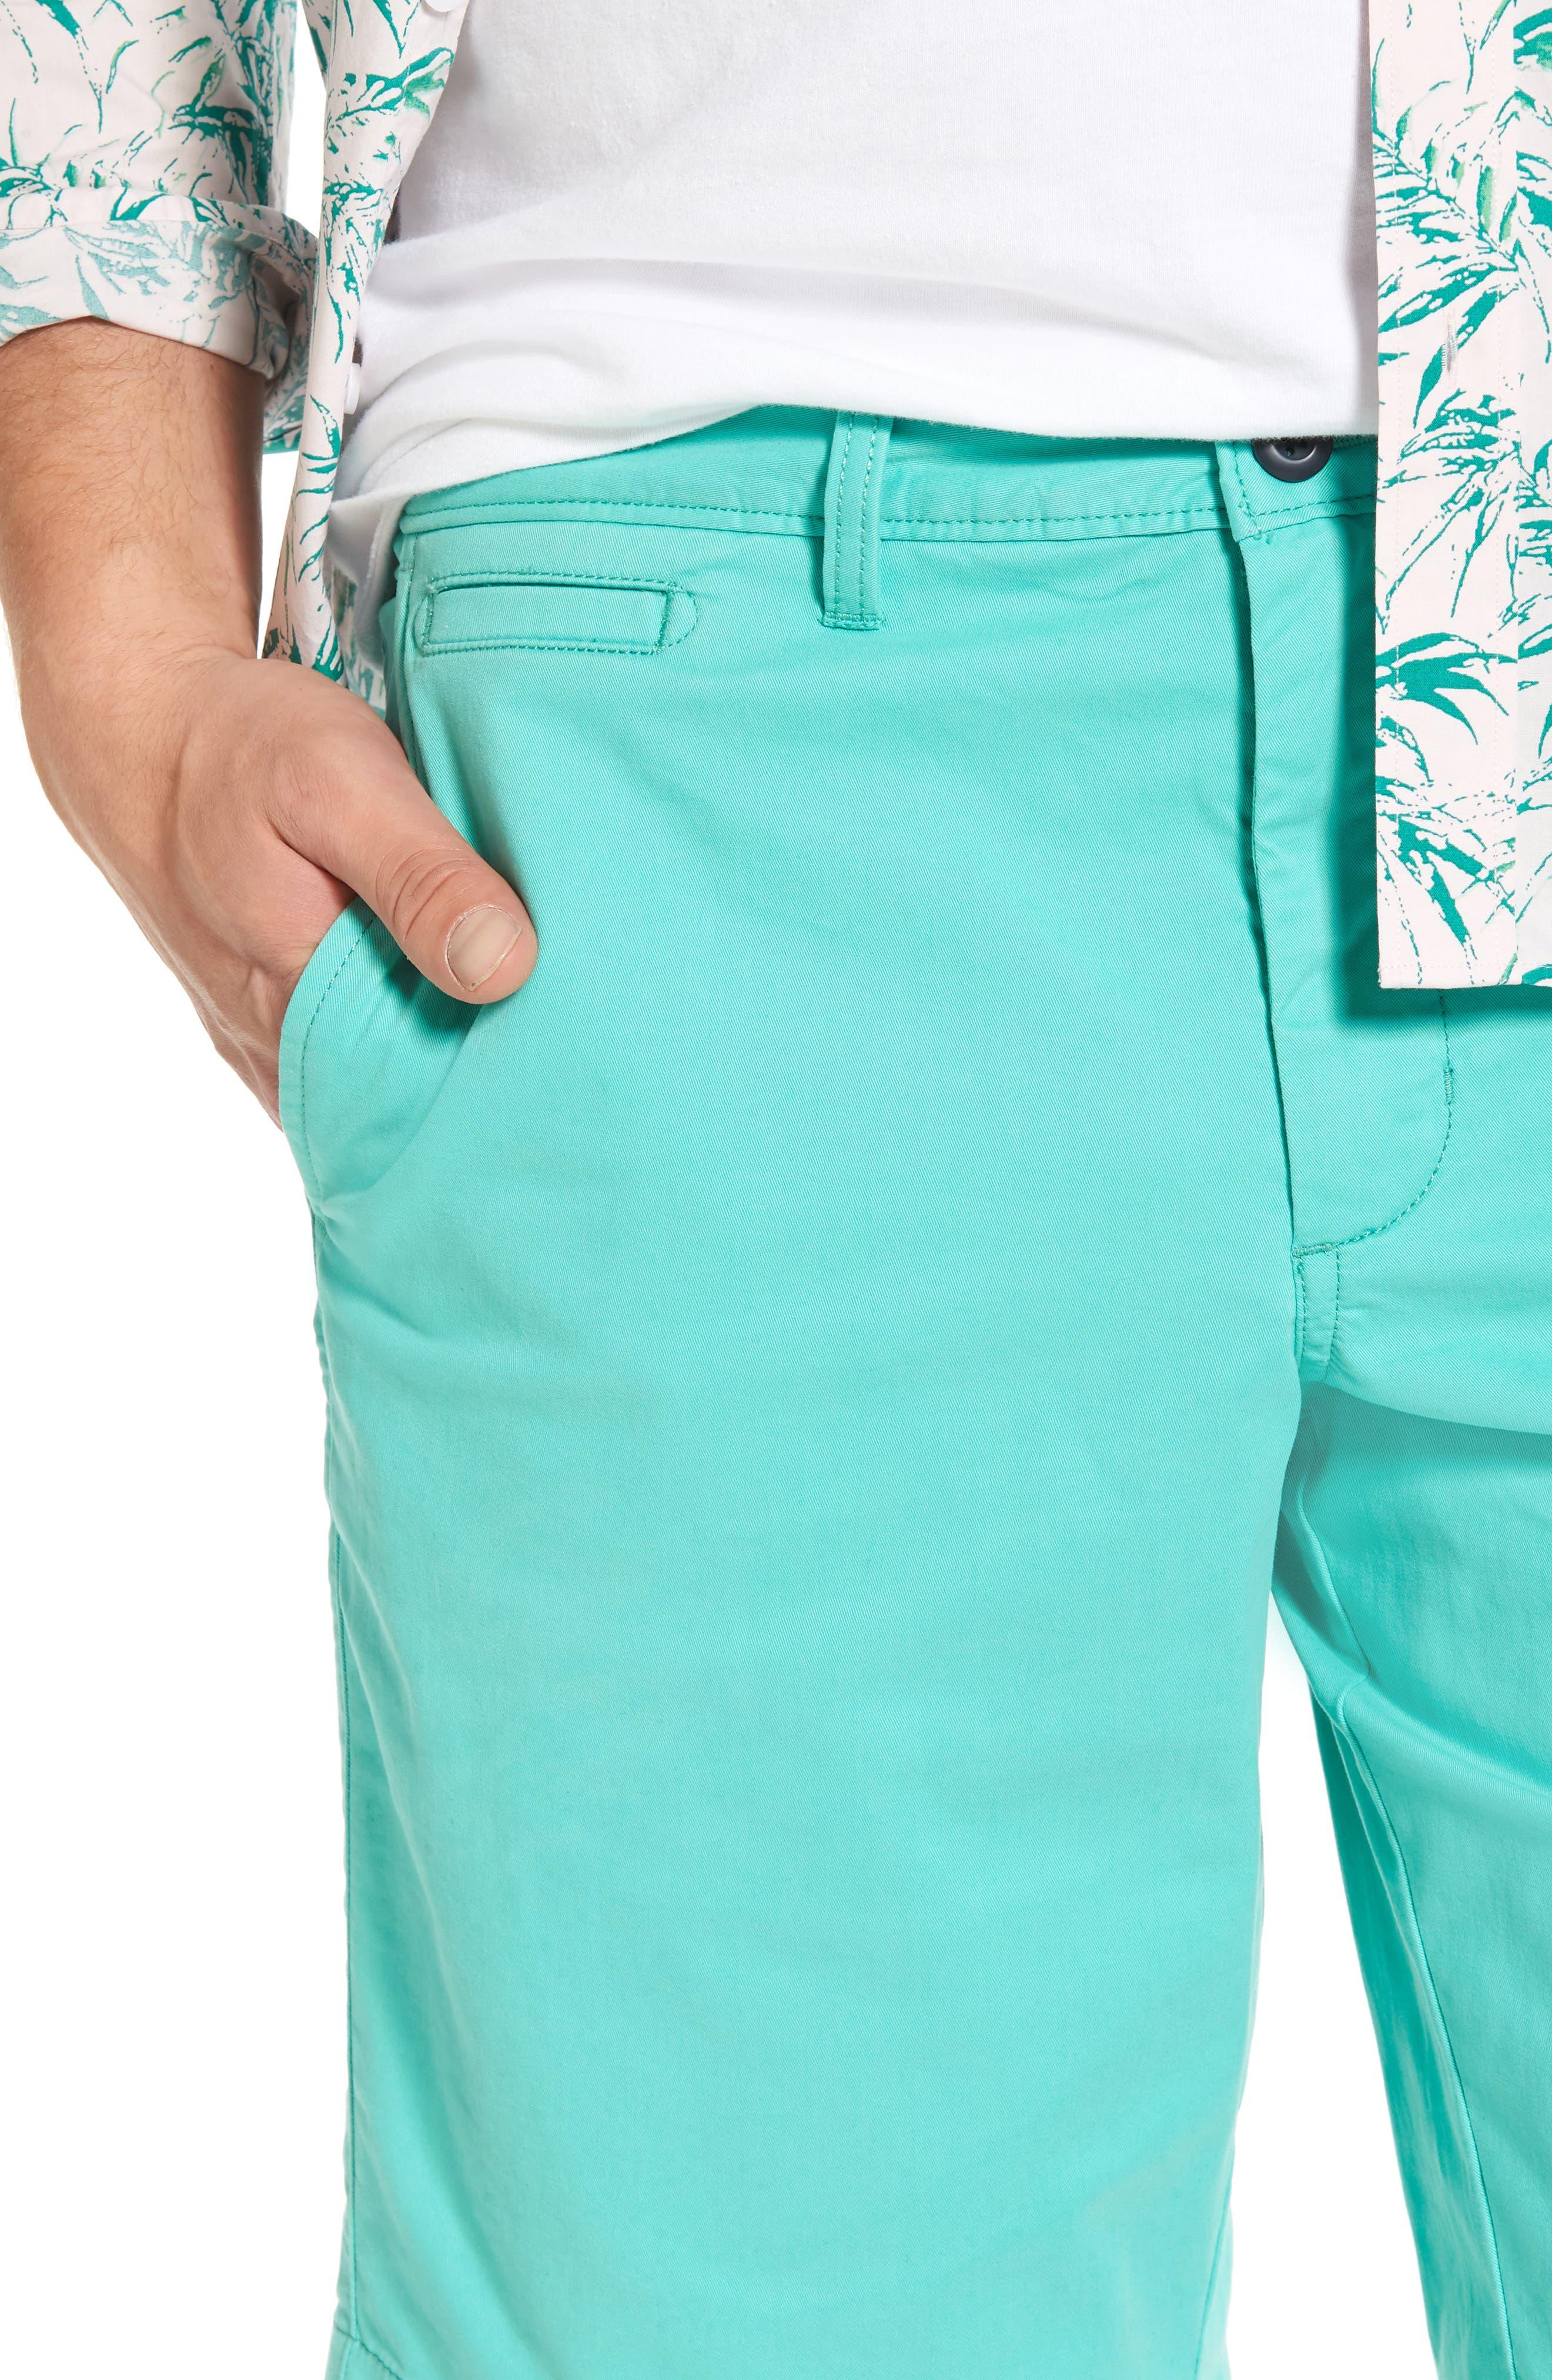 Ballard Slim Fit Stretch Chino 11-Inch Shorts,                             Alternate thumbnail 57, color,